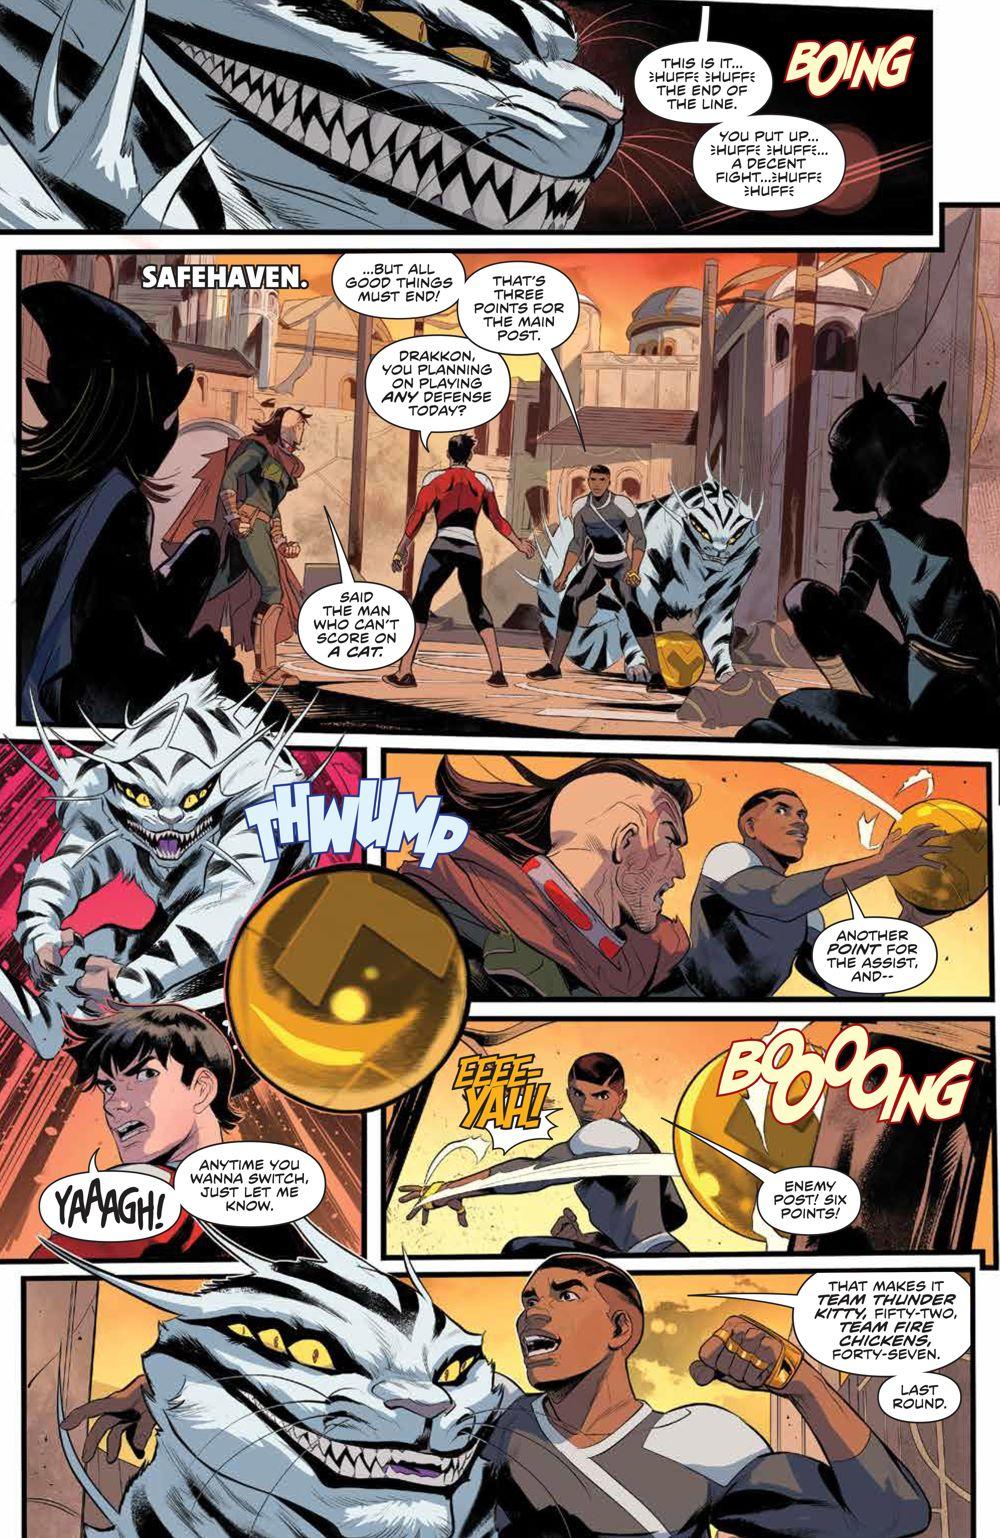 PowerRangers_007_PRESS_3 ComicList Previews: POWER RANGERS #7